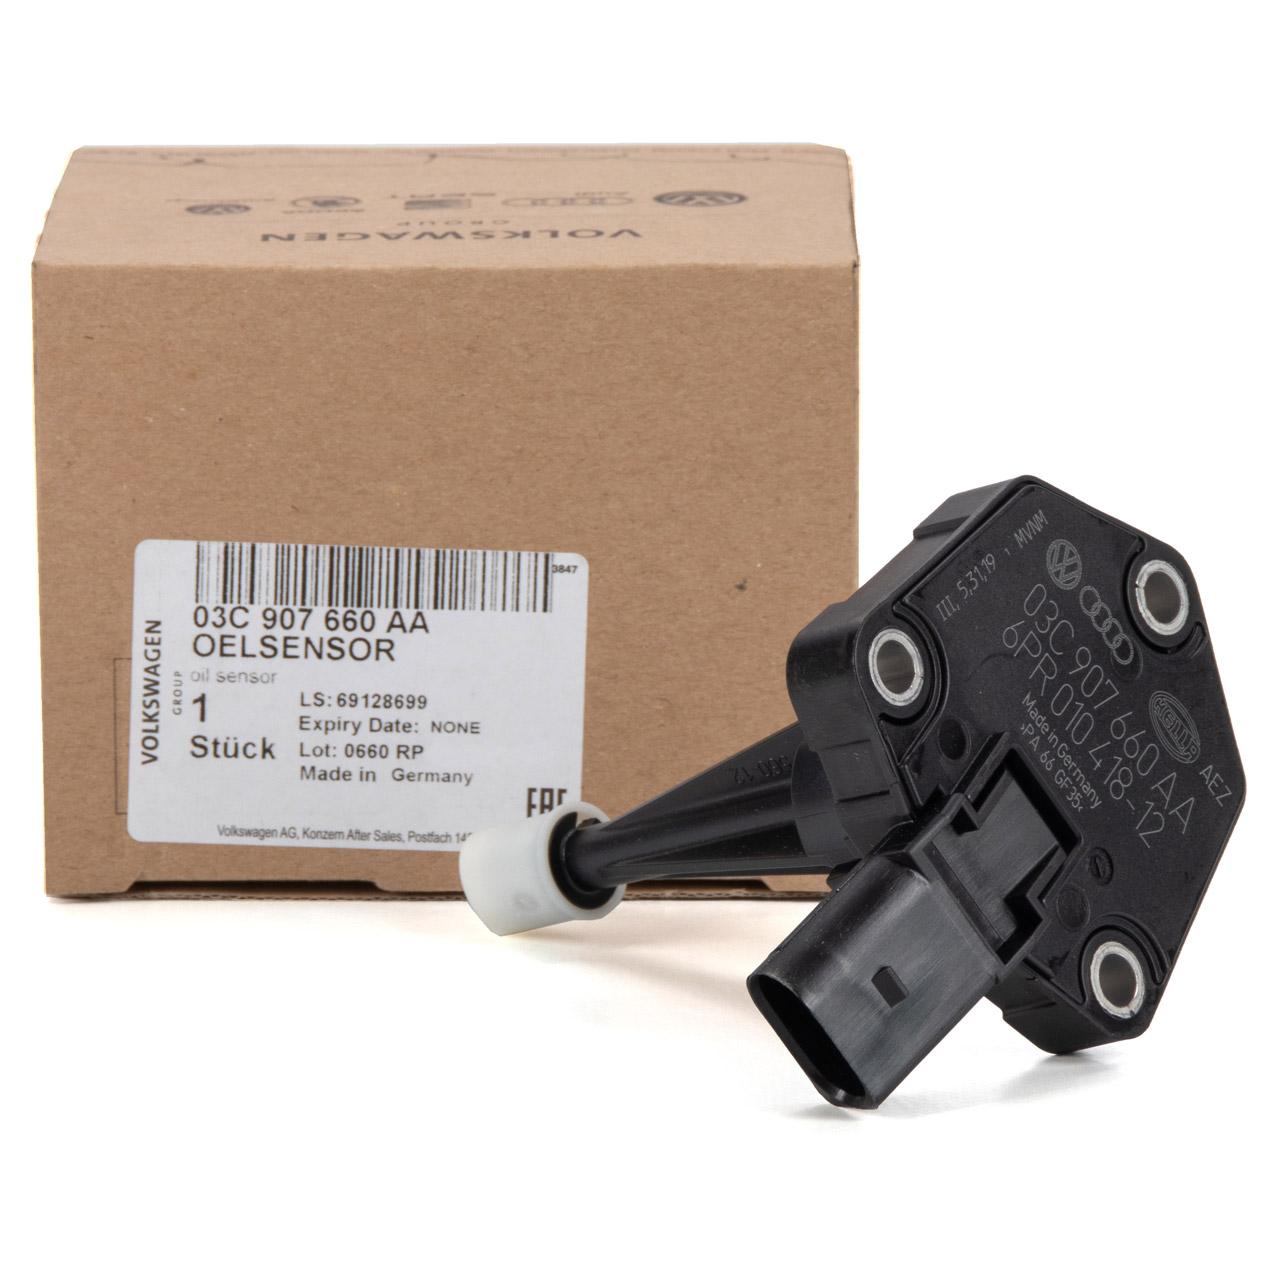 ORIGINAL VW AUDI SEAT PORSCHE Ölniveausensor Sensor Ölstand A4 B8 A6 Ibiza 4 03C907660AA